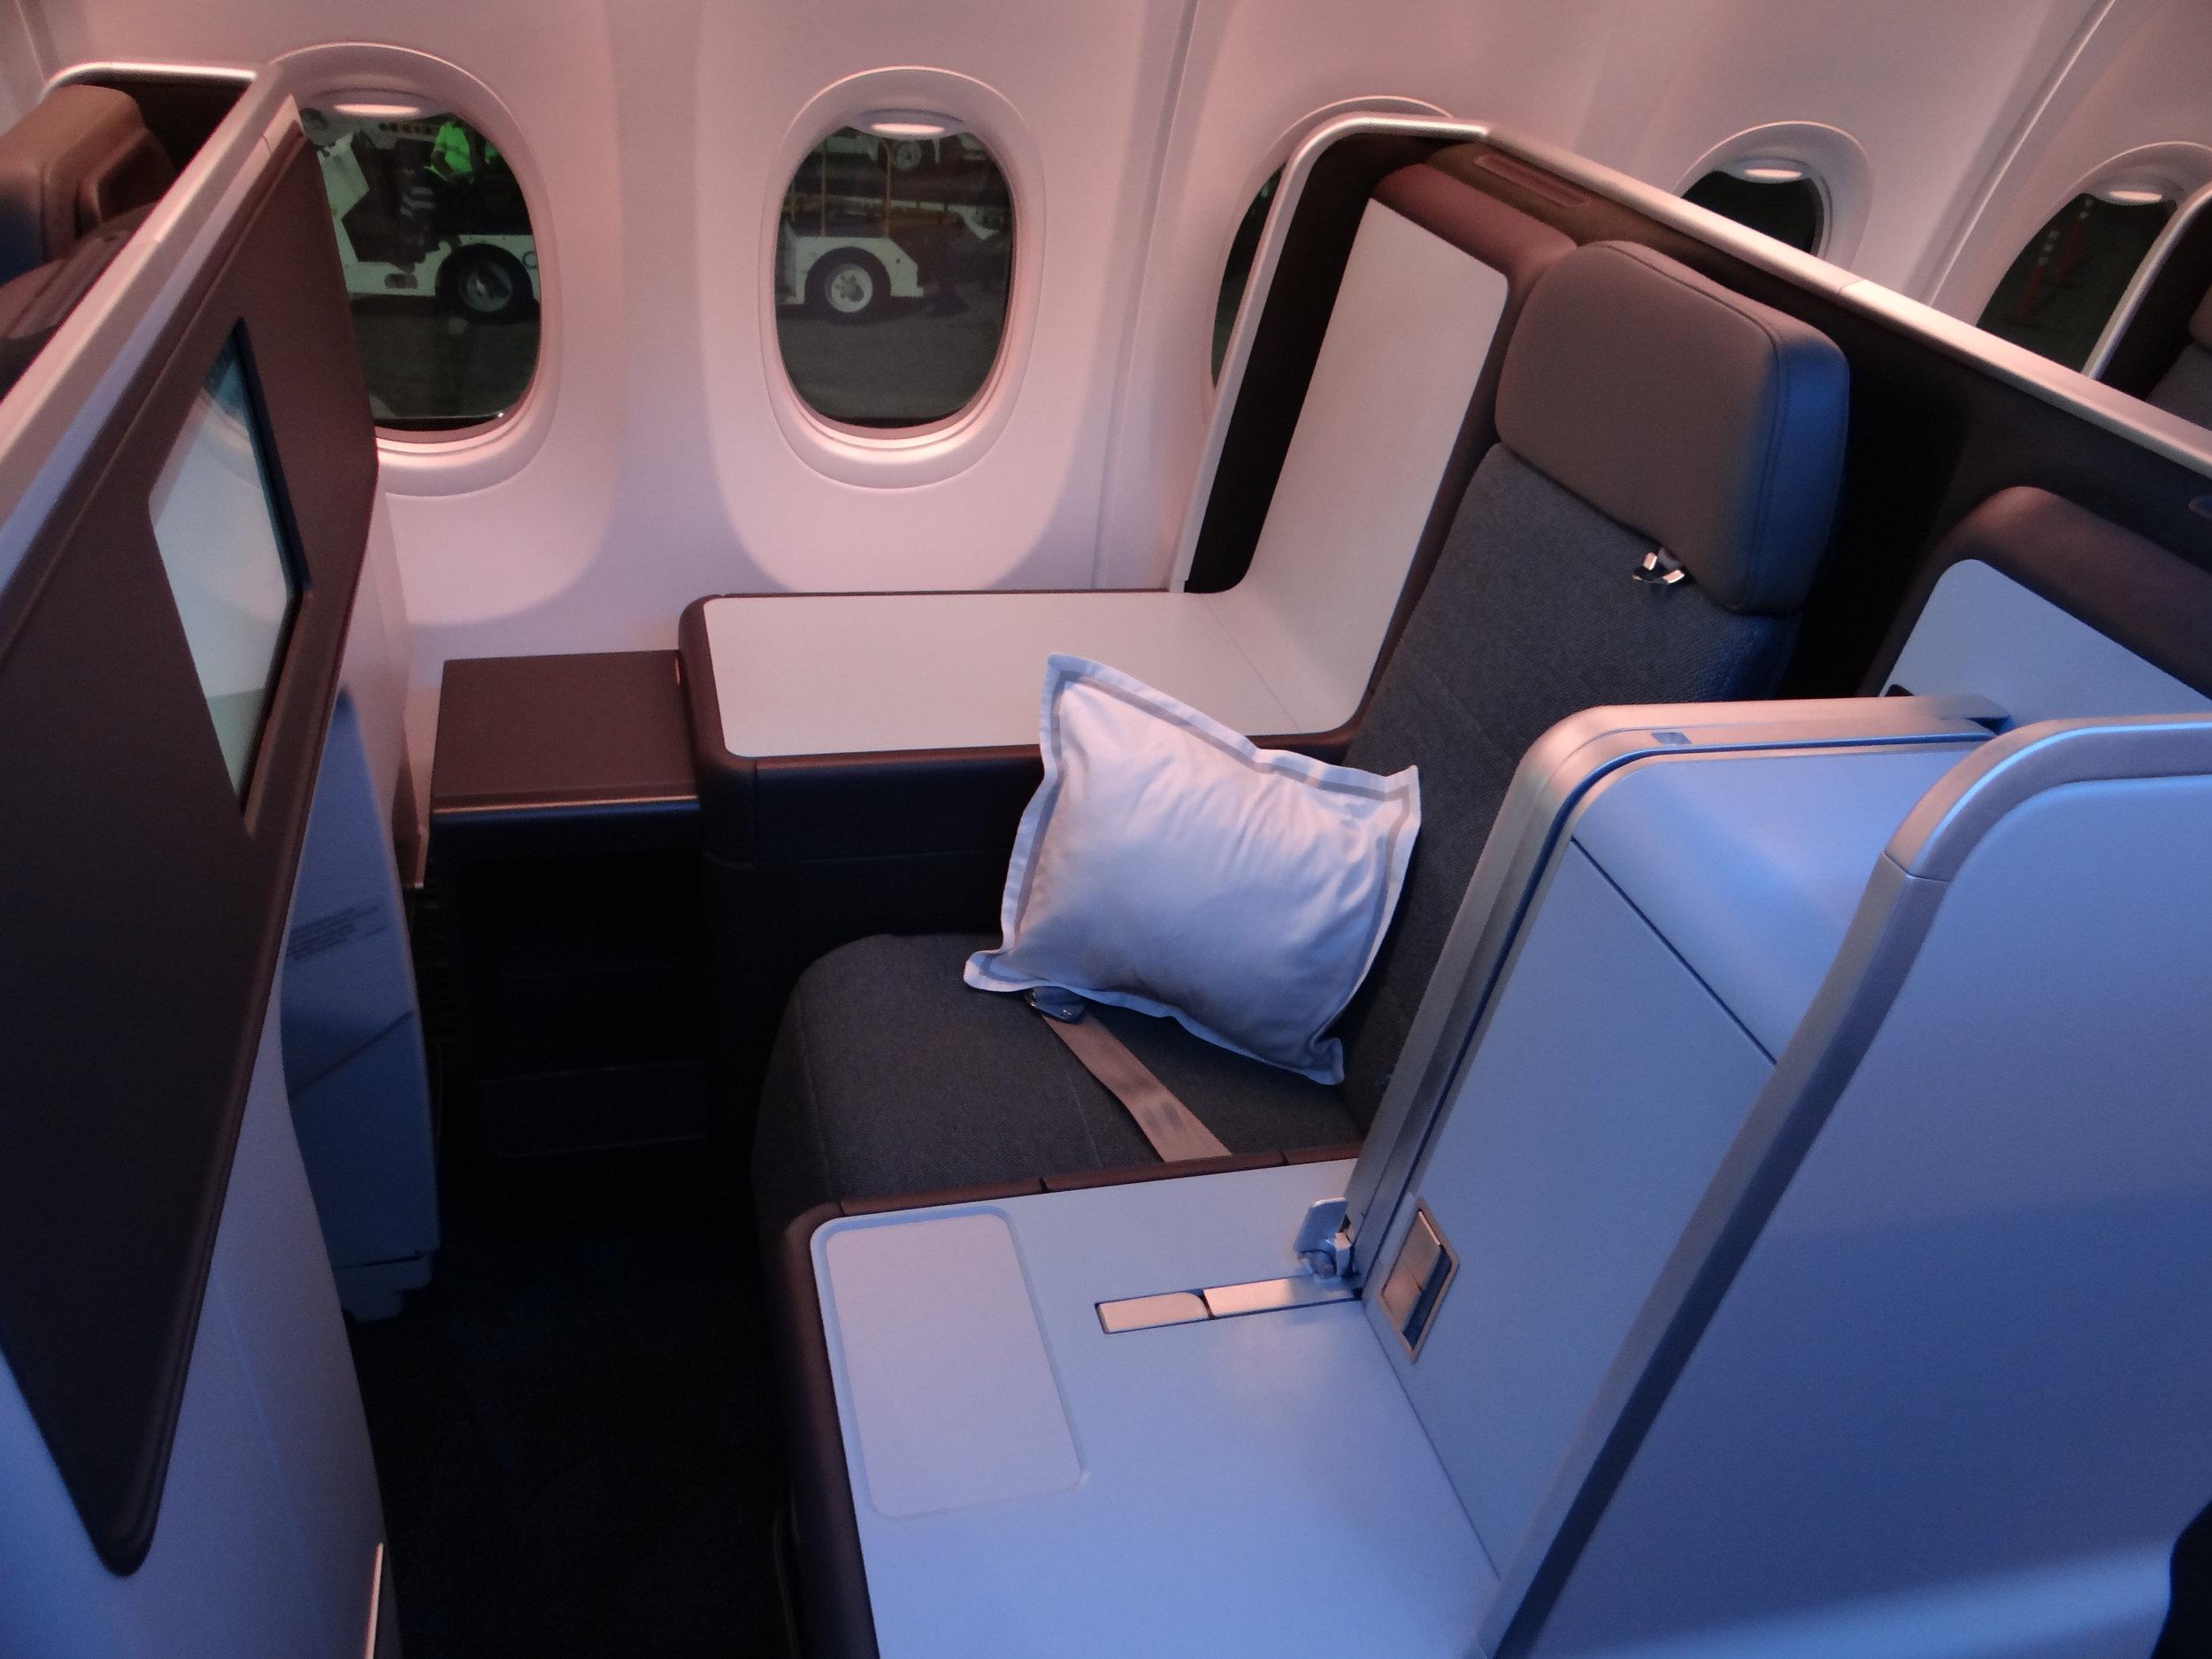 flydubai business class seat throne.jpg